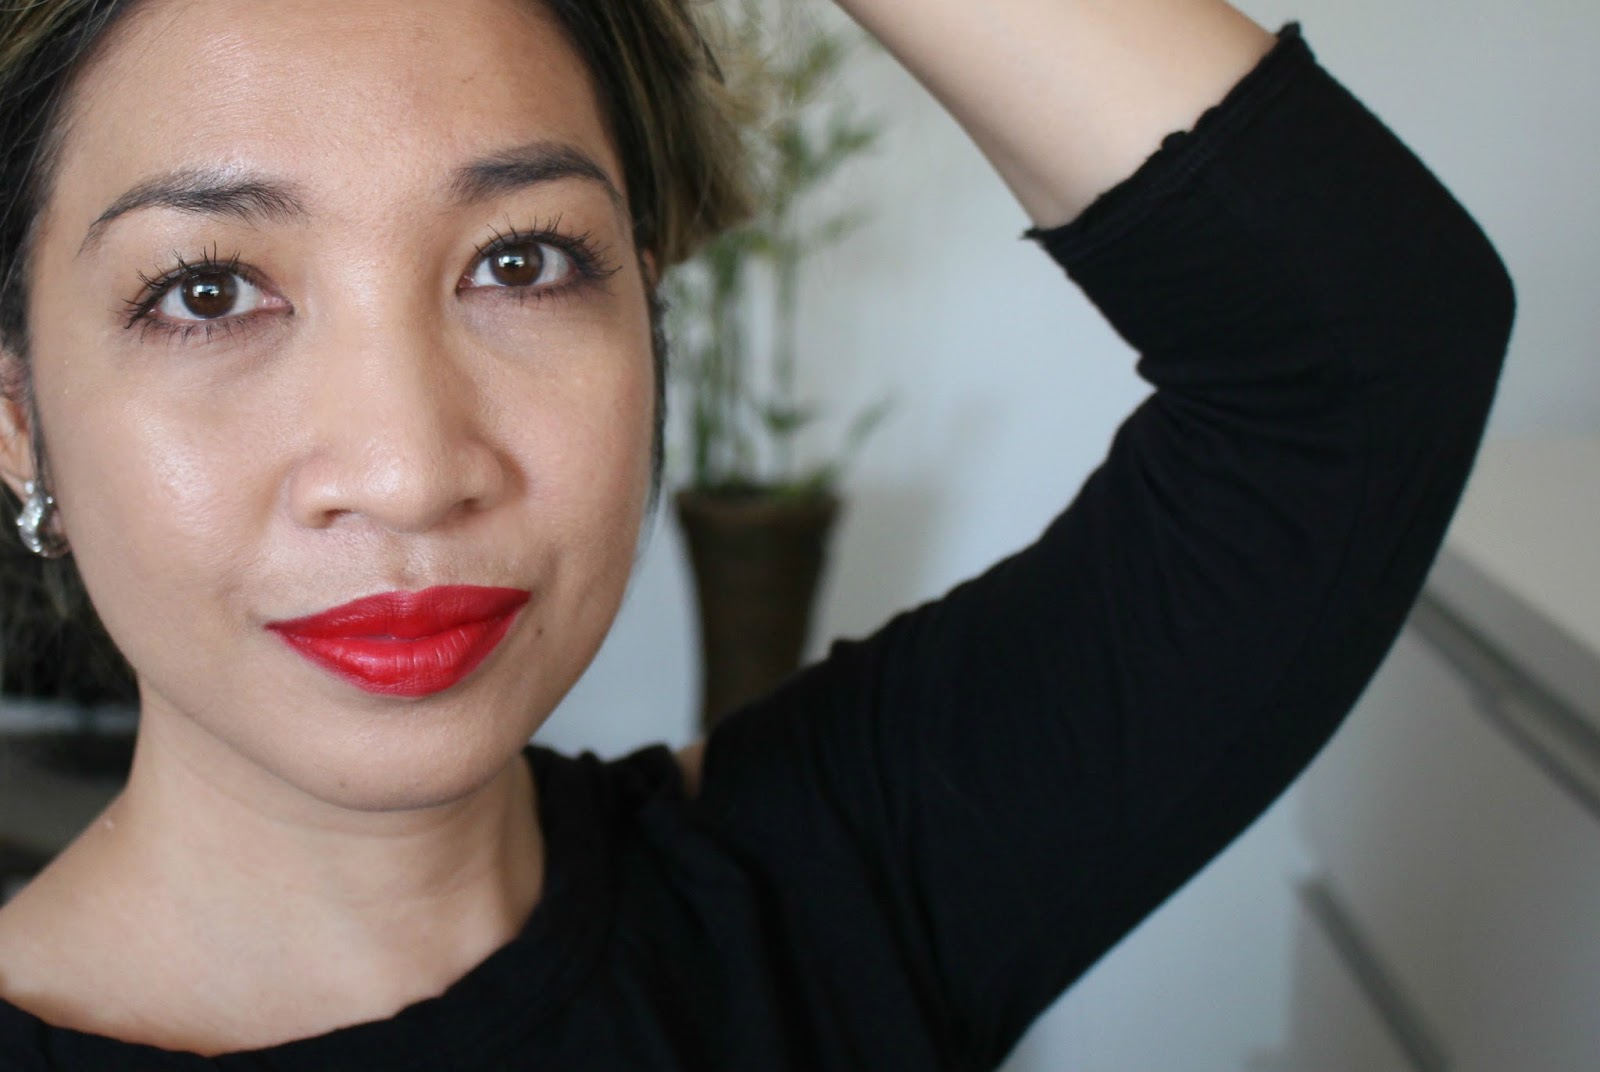 can lashes grow back? neubrow brow enhancing serum